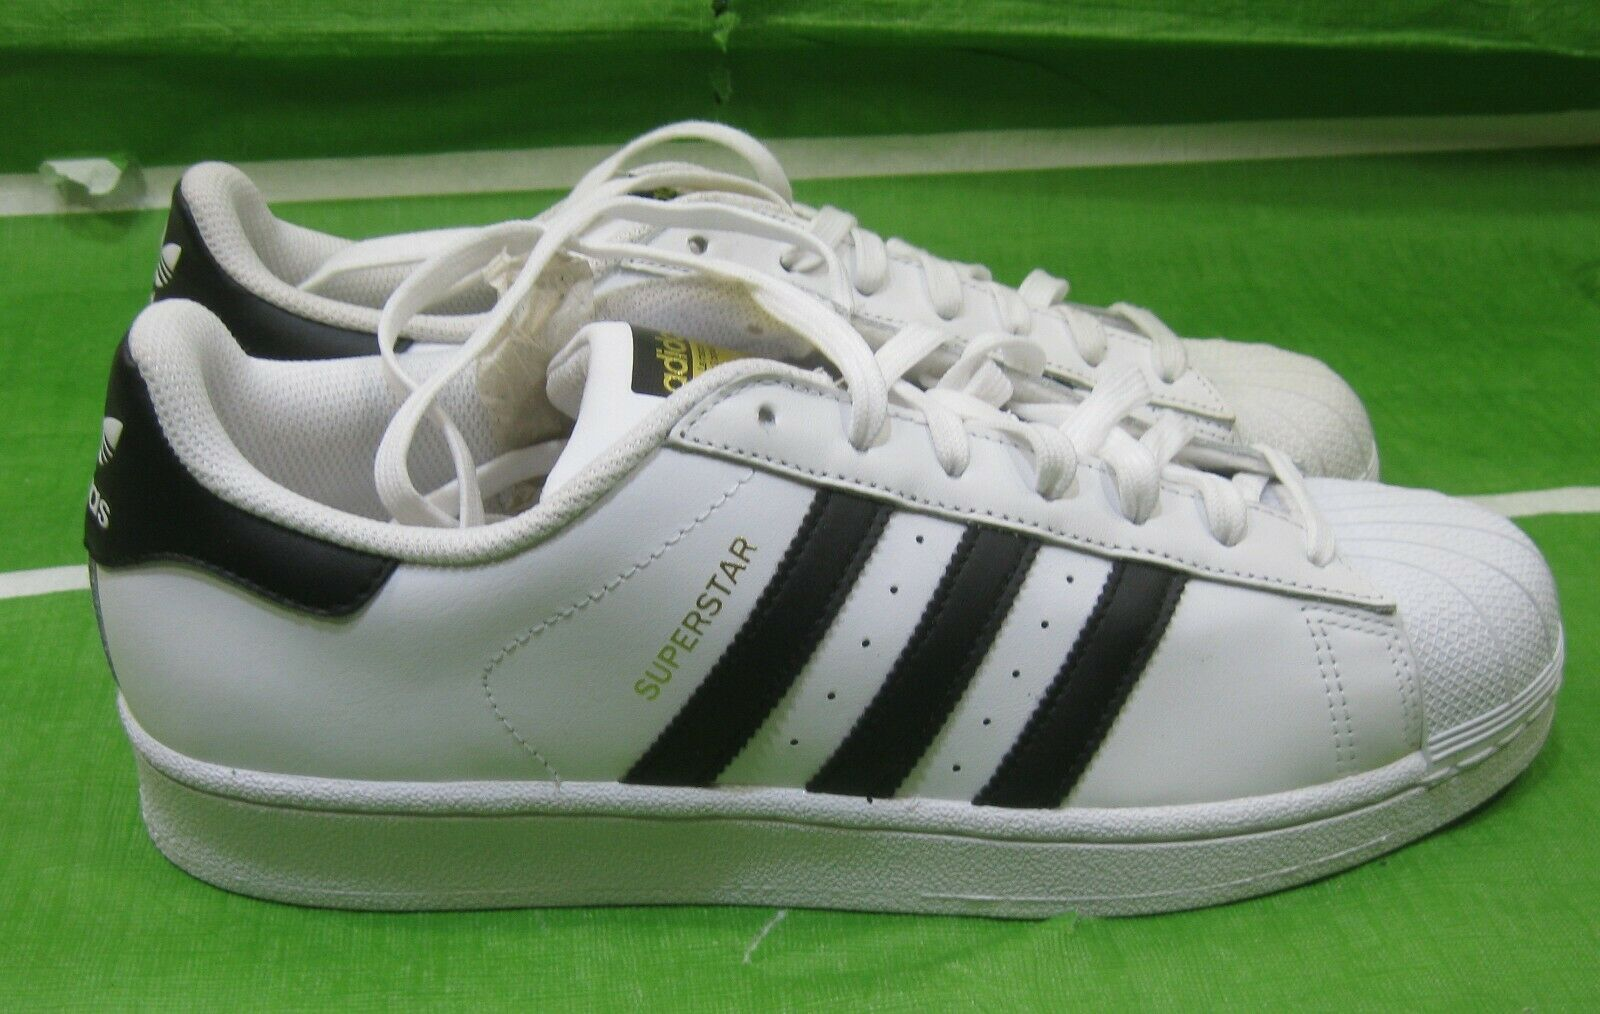 Adidas Originals Superstar Foundation SNEAKERS C77124  Size 10-9.5